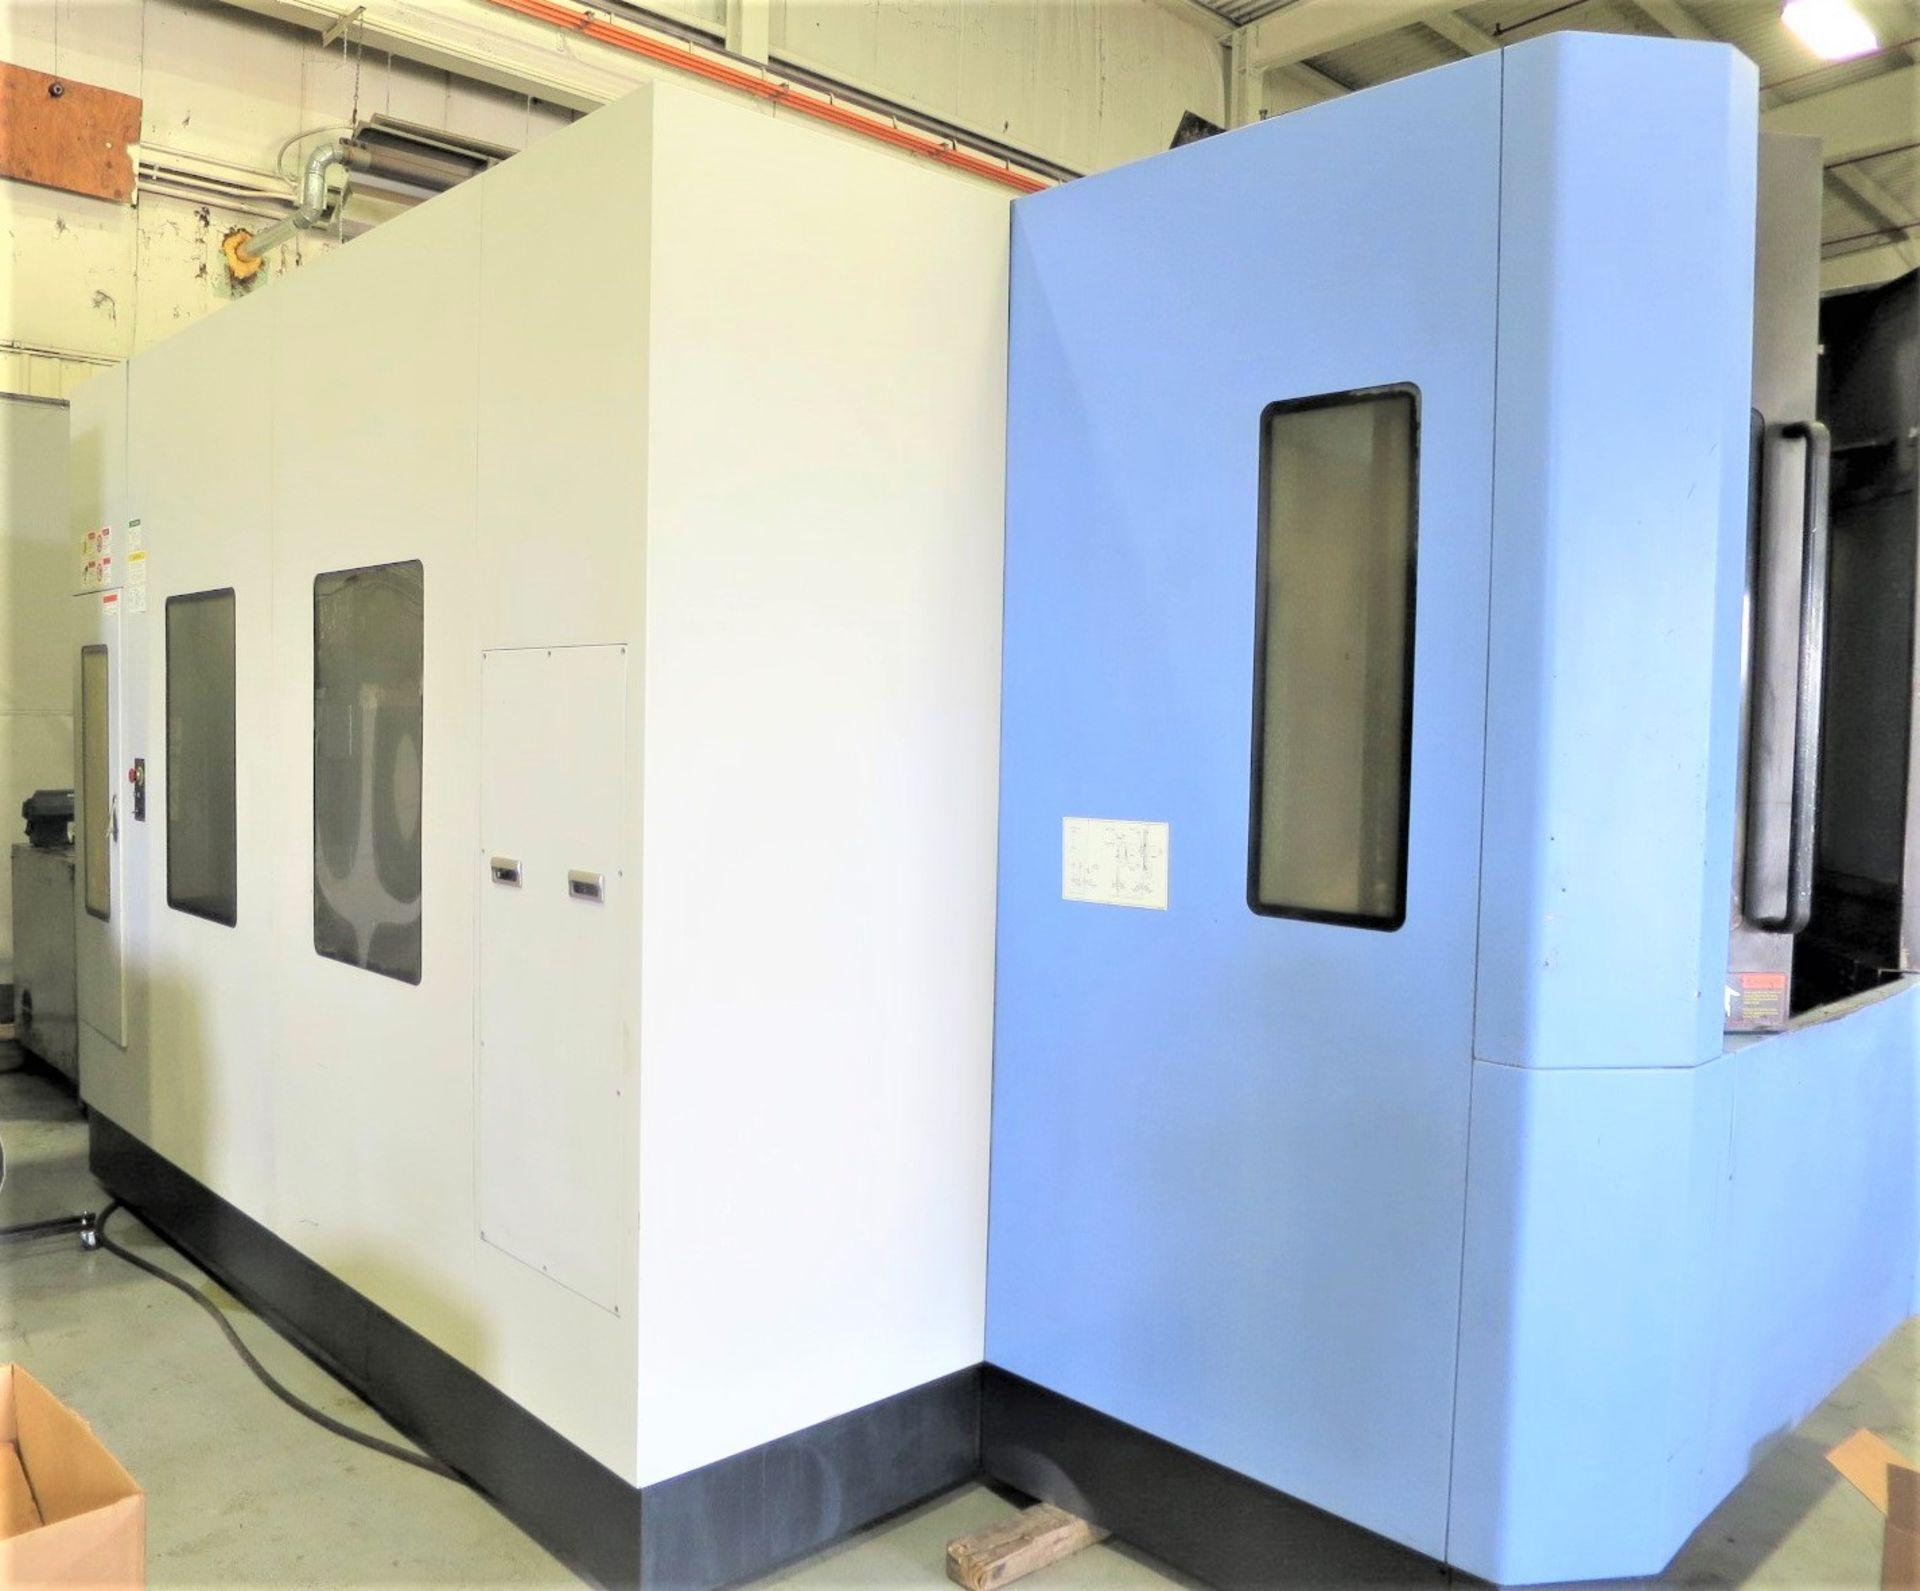 "Lot 38 - 20""x20"" Doosan HP5500 CNC 4-Axis Horizontal Machining Center, S/N HP550139, New 2008"